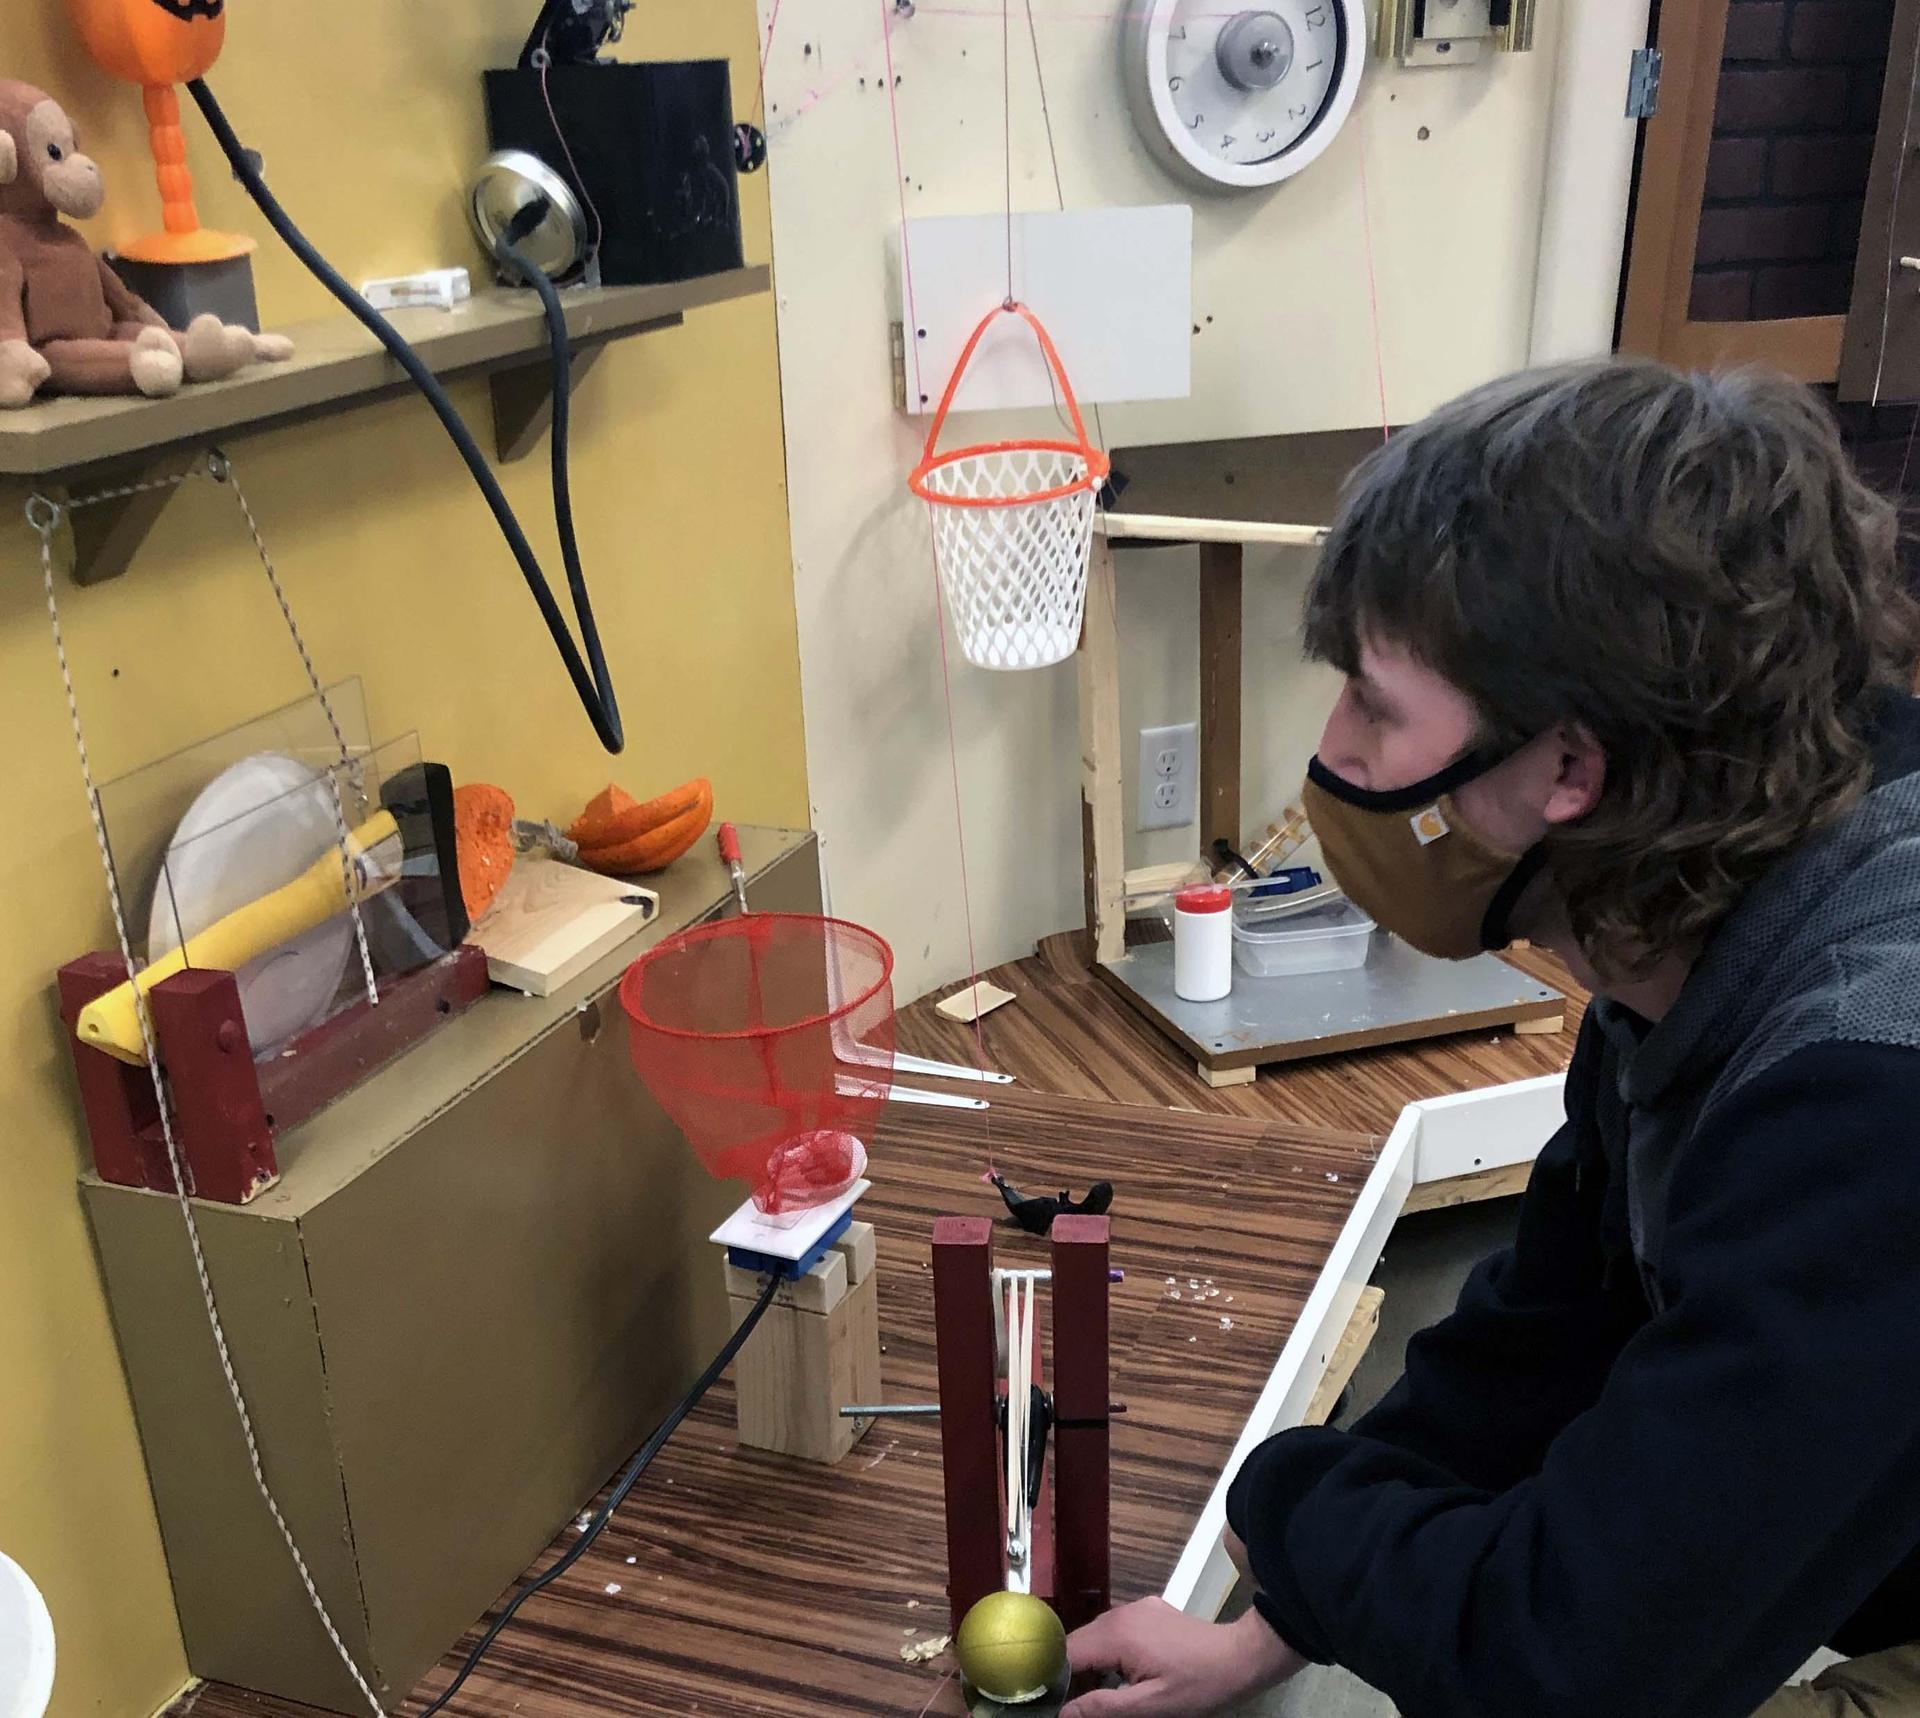 AHS Rube Goldberg team member at work